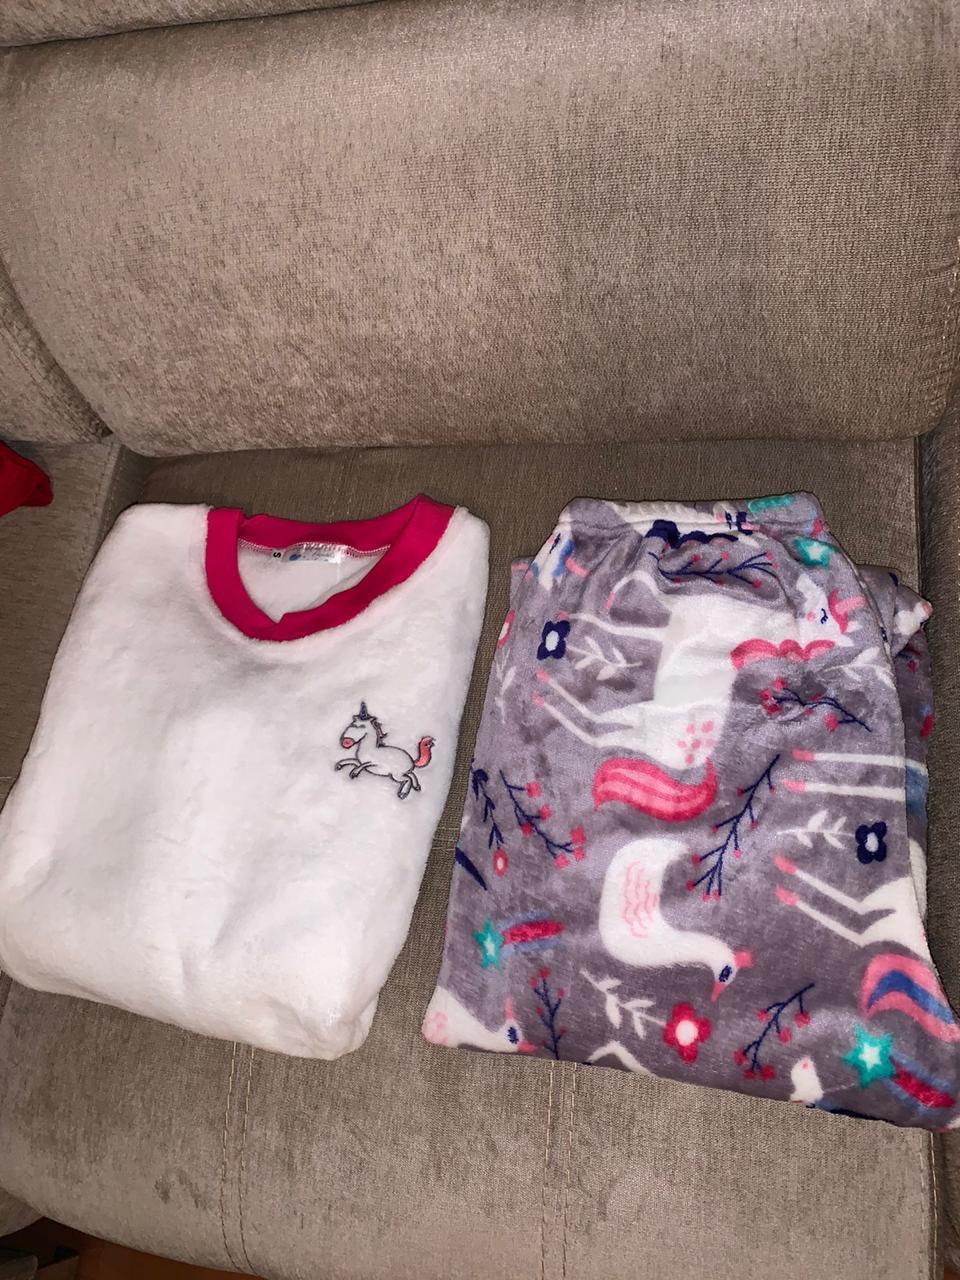 pijama blanca para dama en Bogota, centro comercial sorpresas